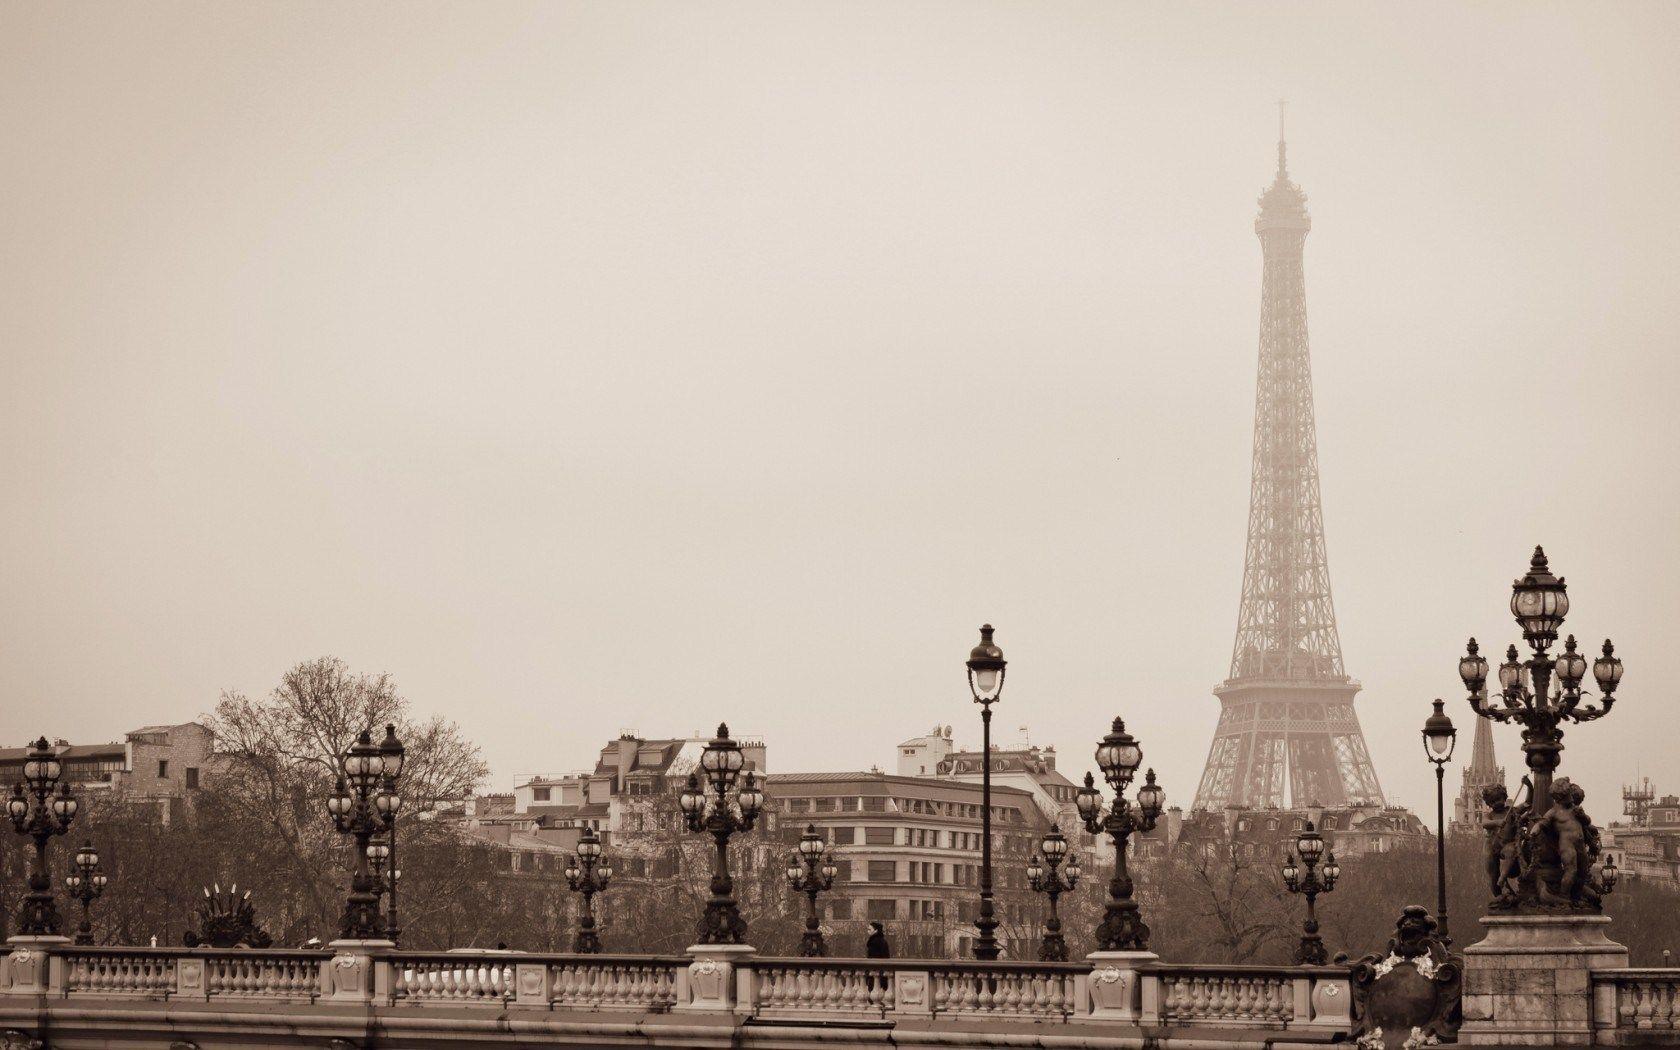 Hd wallpaper paris - Eiffel Tower Paris France Photo Hd Wallpaper Freehdwalls